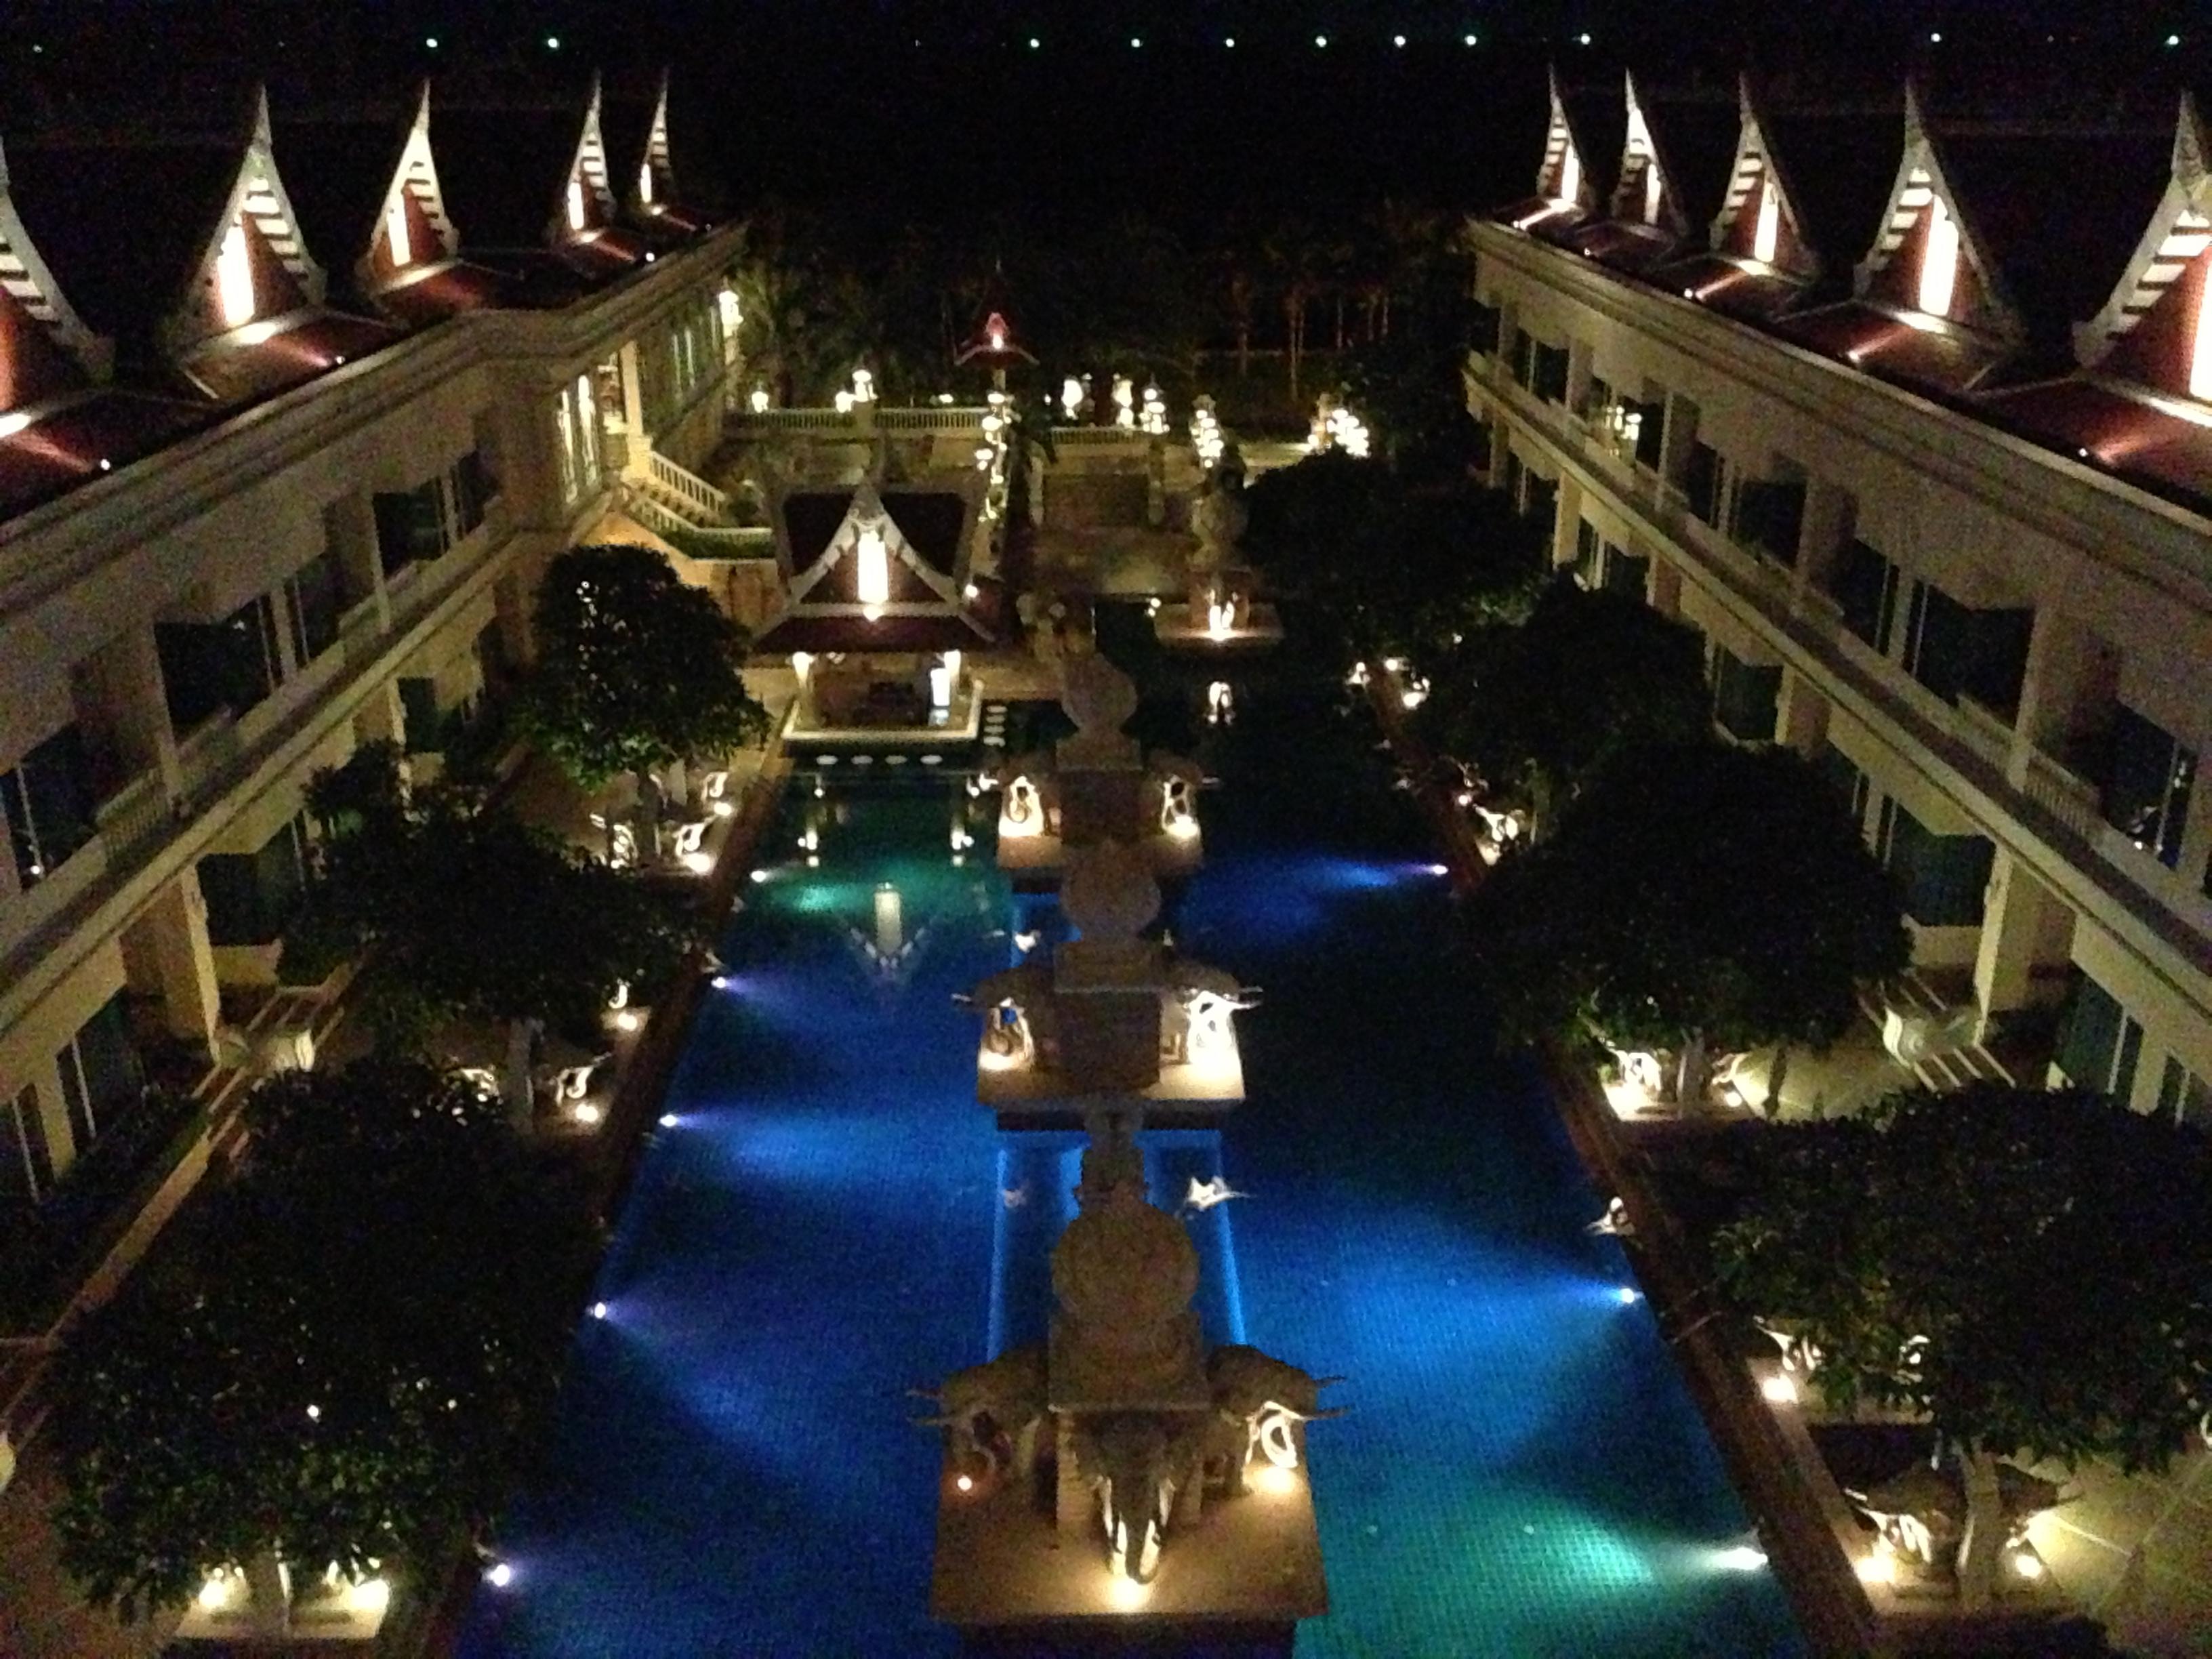 【i旅行】泰国华欣,曼谷6日吐槽,购物,观光游 精华